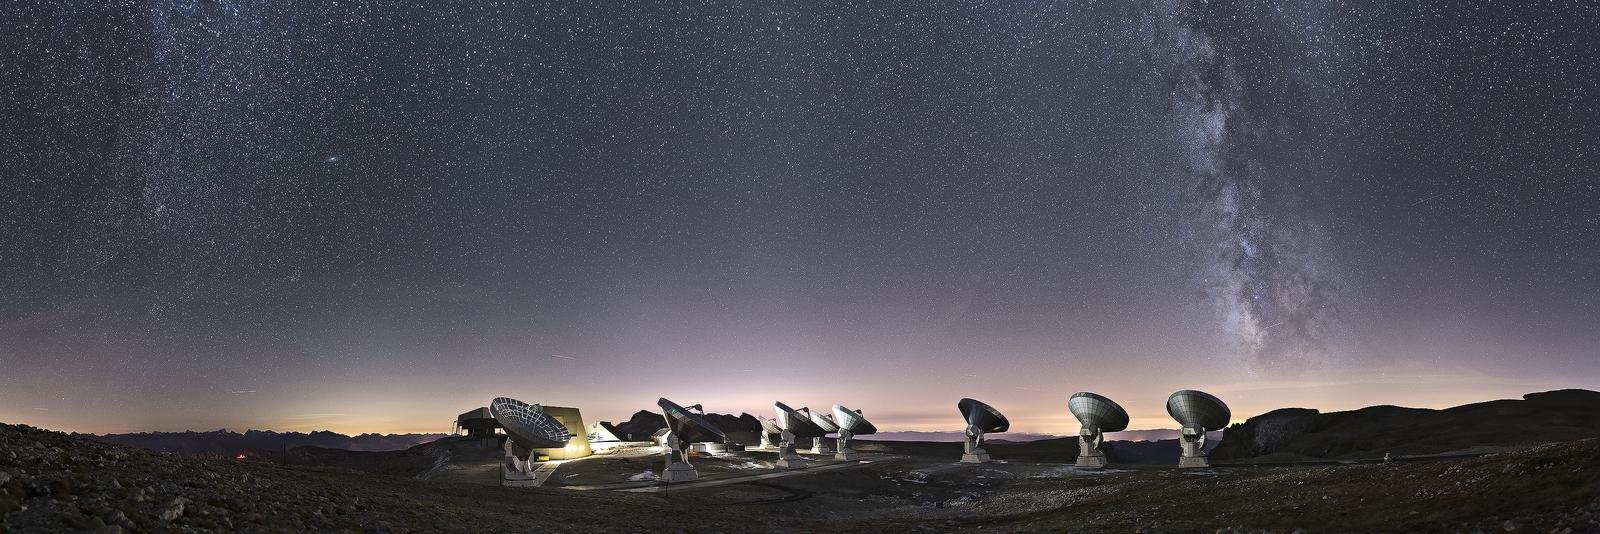 The NOEMA observatory under the night sky.jpg